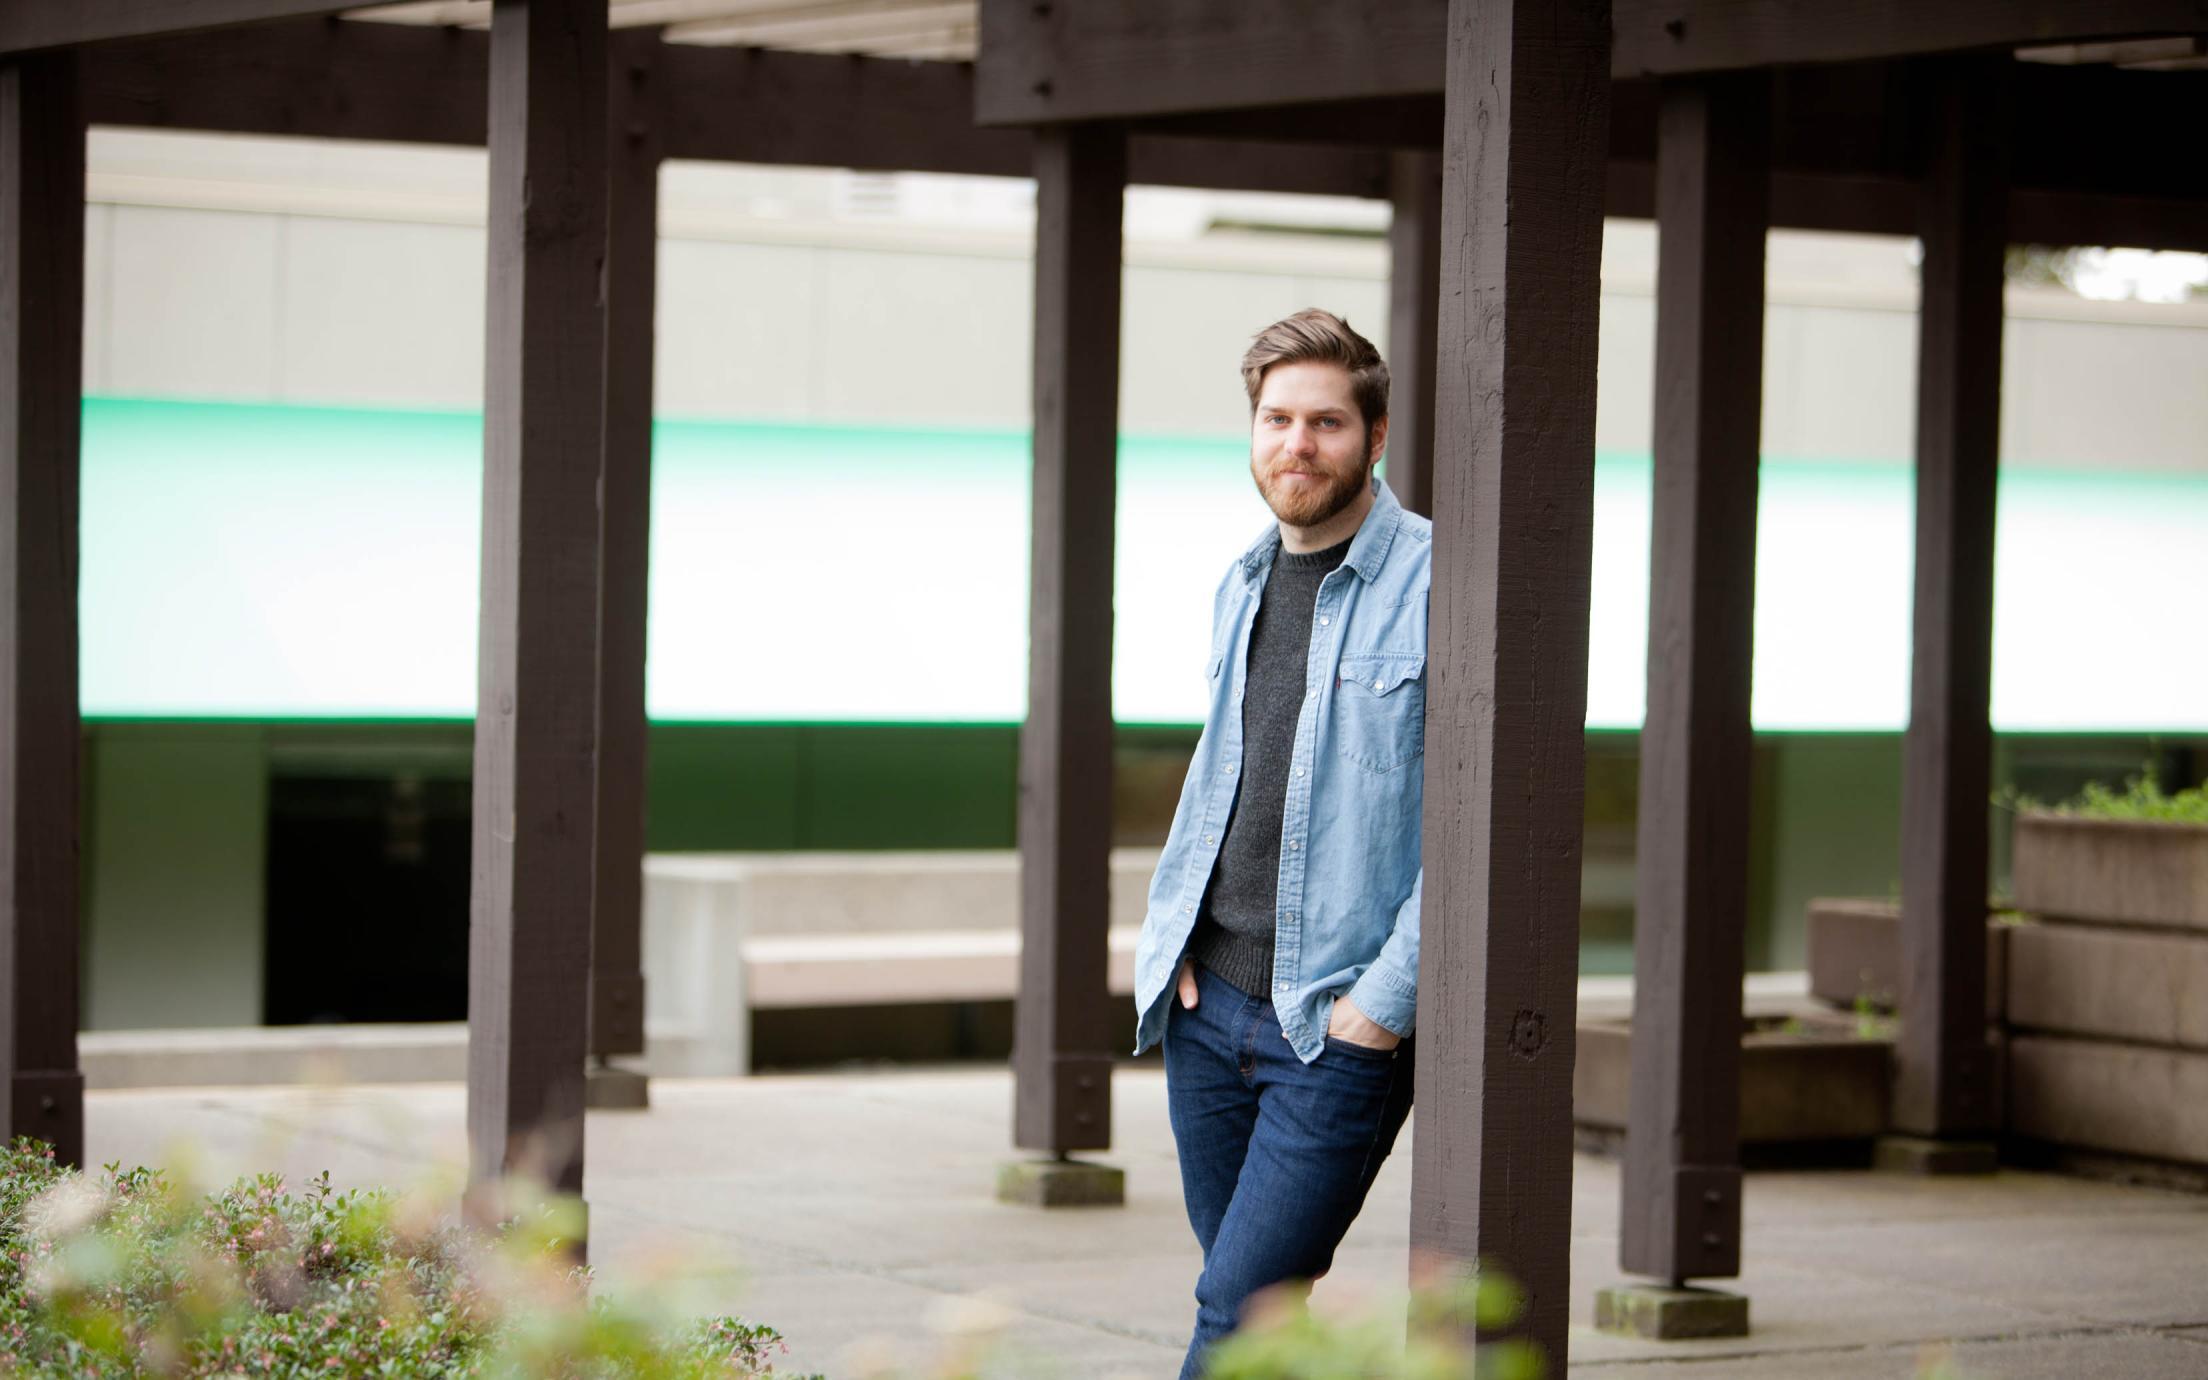 Matt Lineker, a student of VIU's Bachelor in Graphic Design degree program on campus